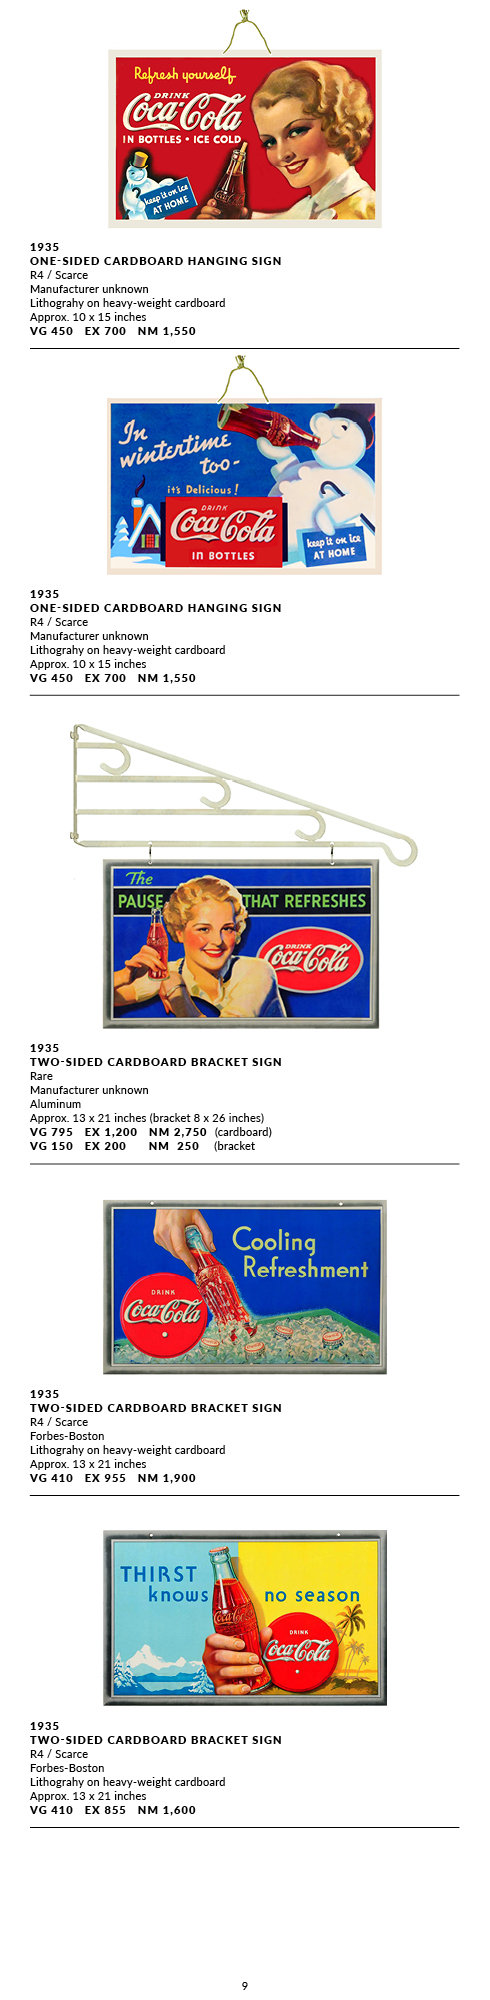 1904-1939RectCardboards (2021)9.jpg